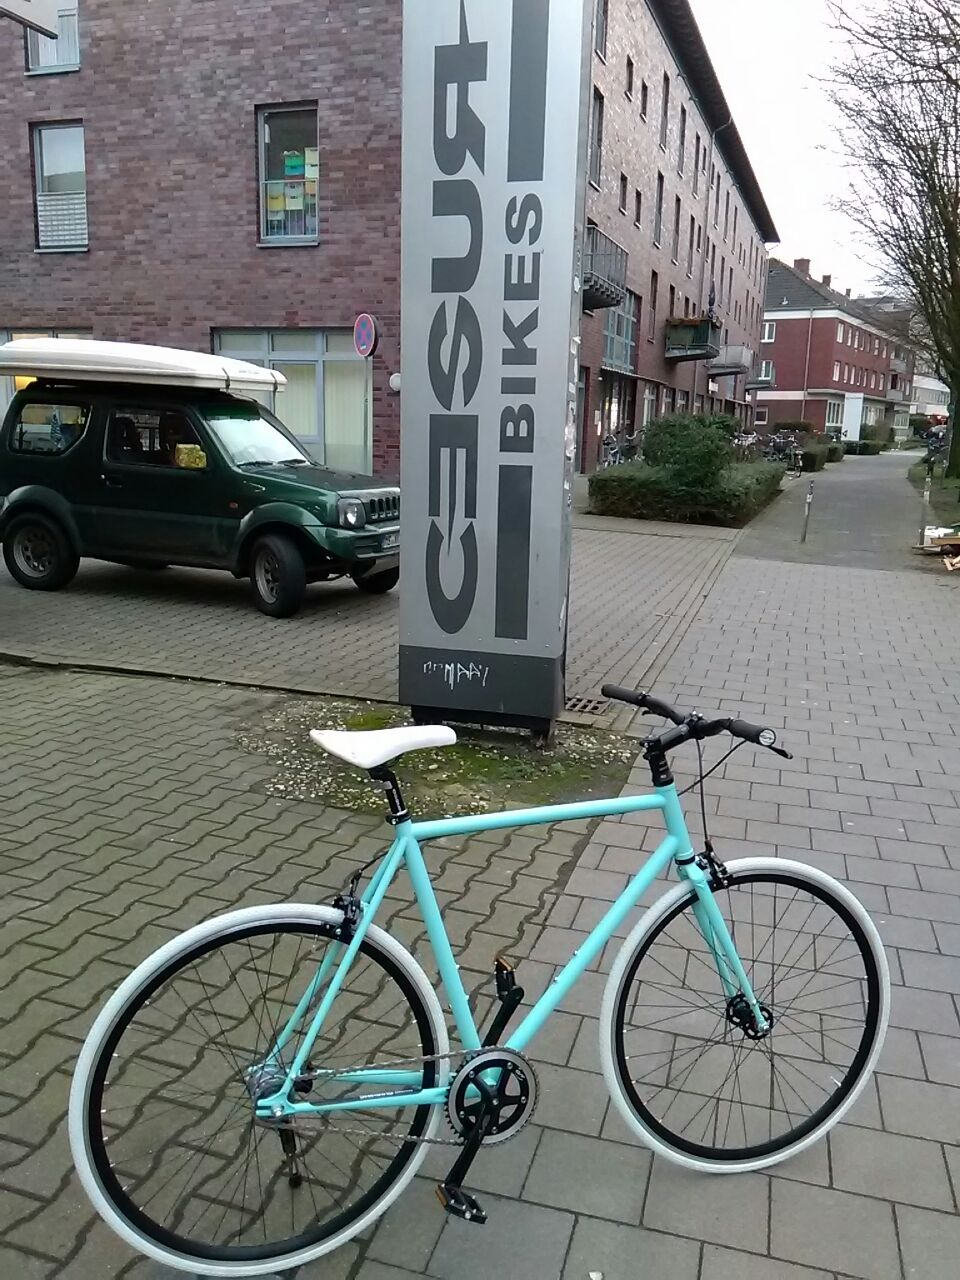 cesur bikes ihr fahrrad nach ma cesur speed 2 gang. Black Bedroom Furniture Sets. Home Design Ideas